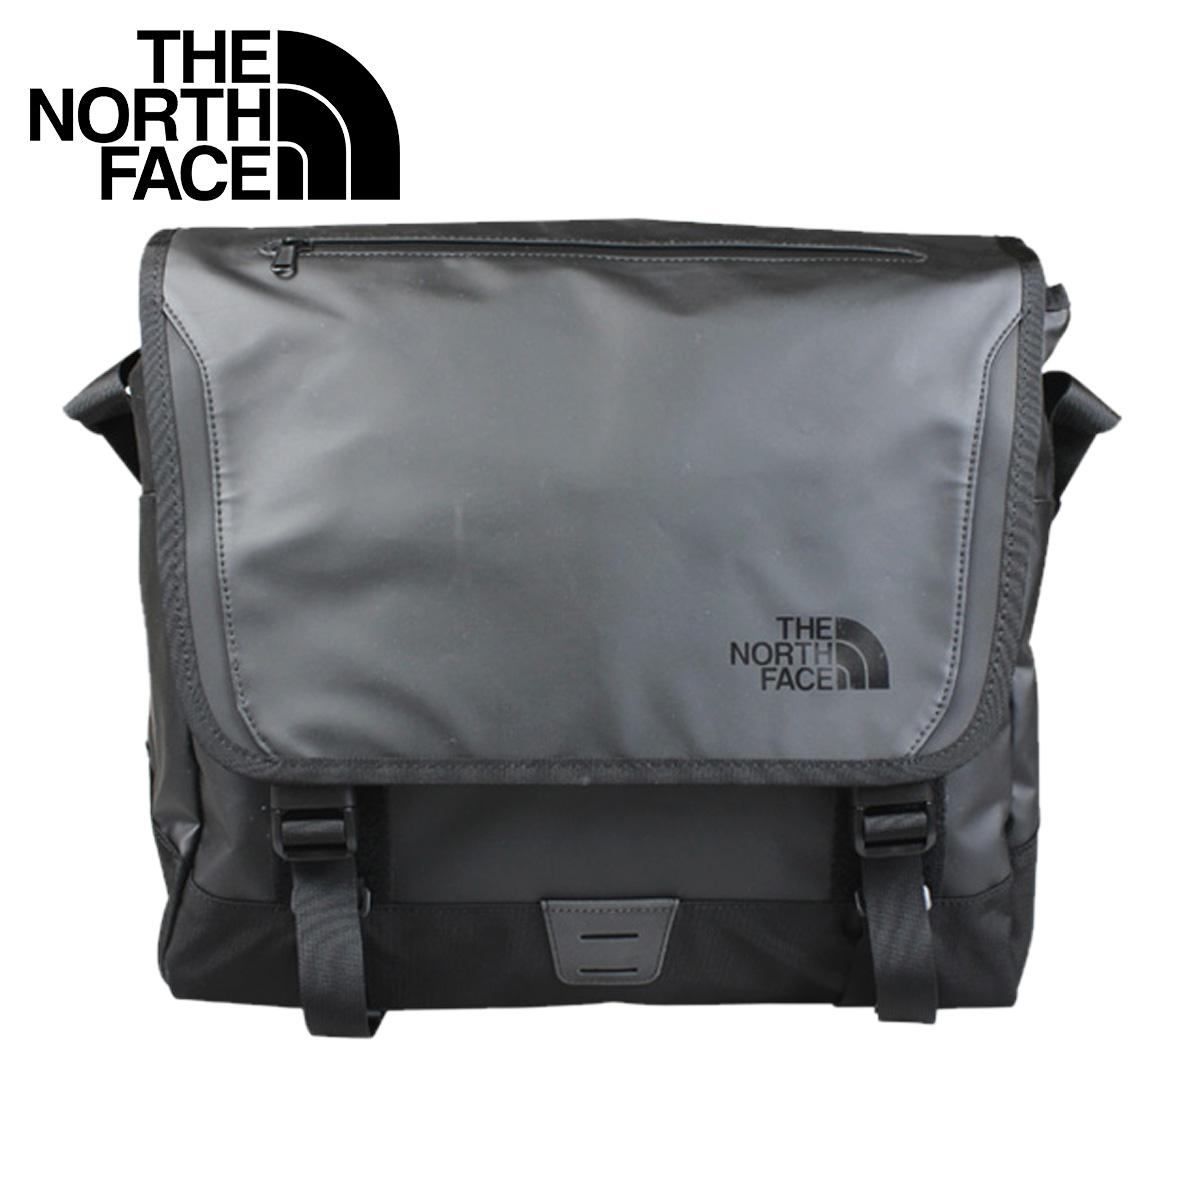 The North Face Base Camp Messenger Medium Bag Style A7ku